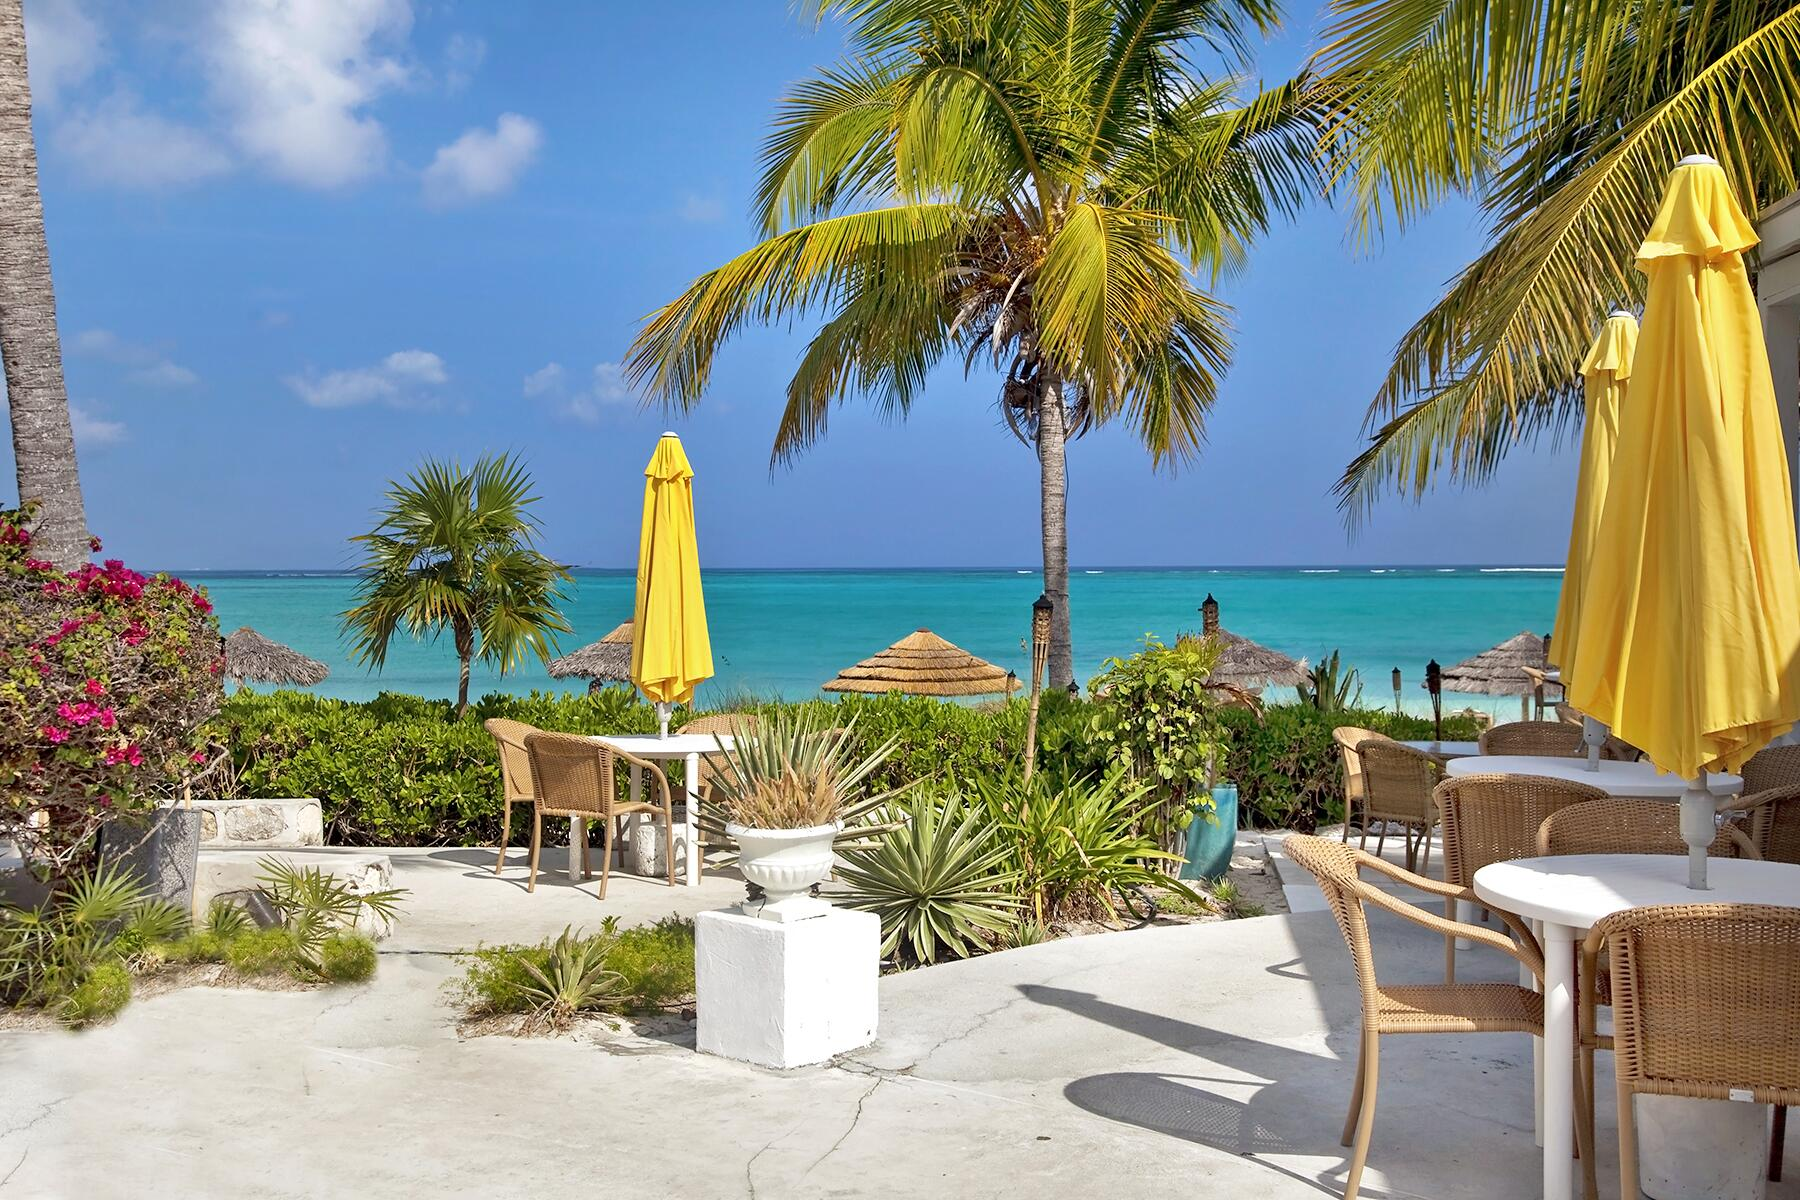 08_TurksAndCaicosCOVID__BeachfrontDining_shutterstock_100965901